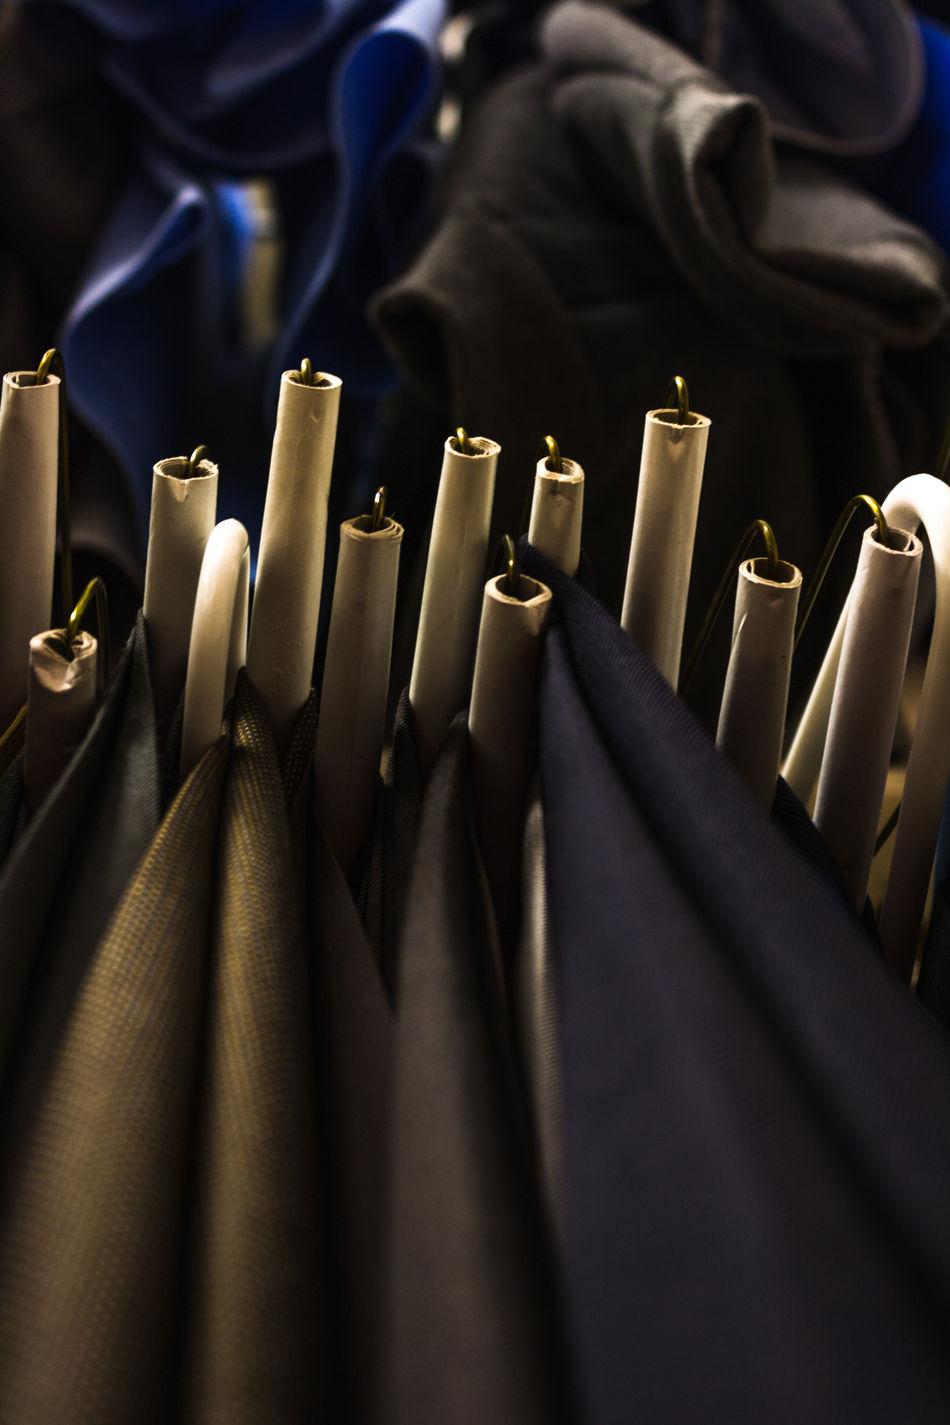 Black Pants Business Attire Businessman Button Up Shirt Dress For Success Hangers Hanging Clothes Hanging Clothing Khaki Pants Looking Up Slacks Suit Up Beautifully Organized